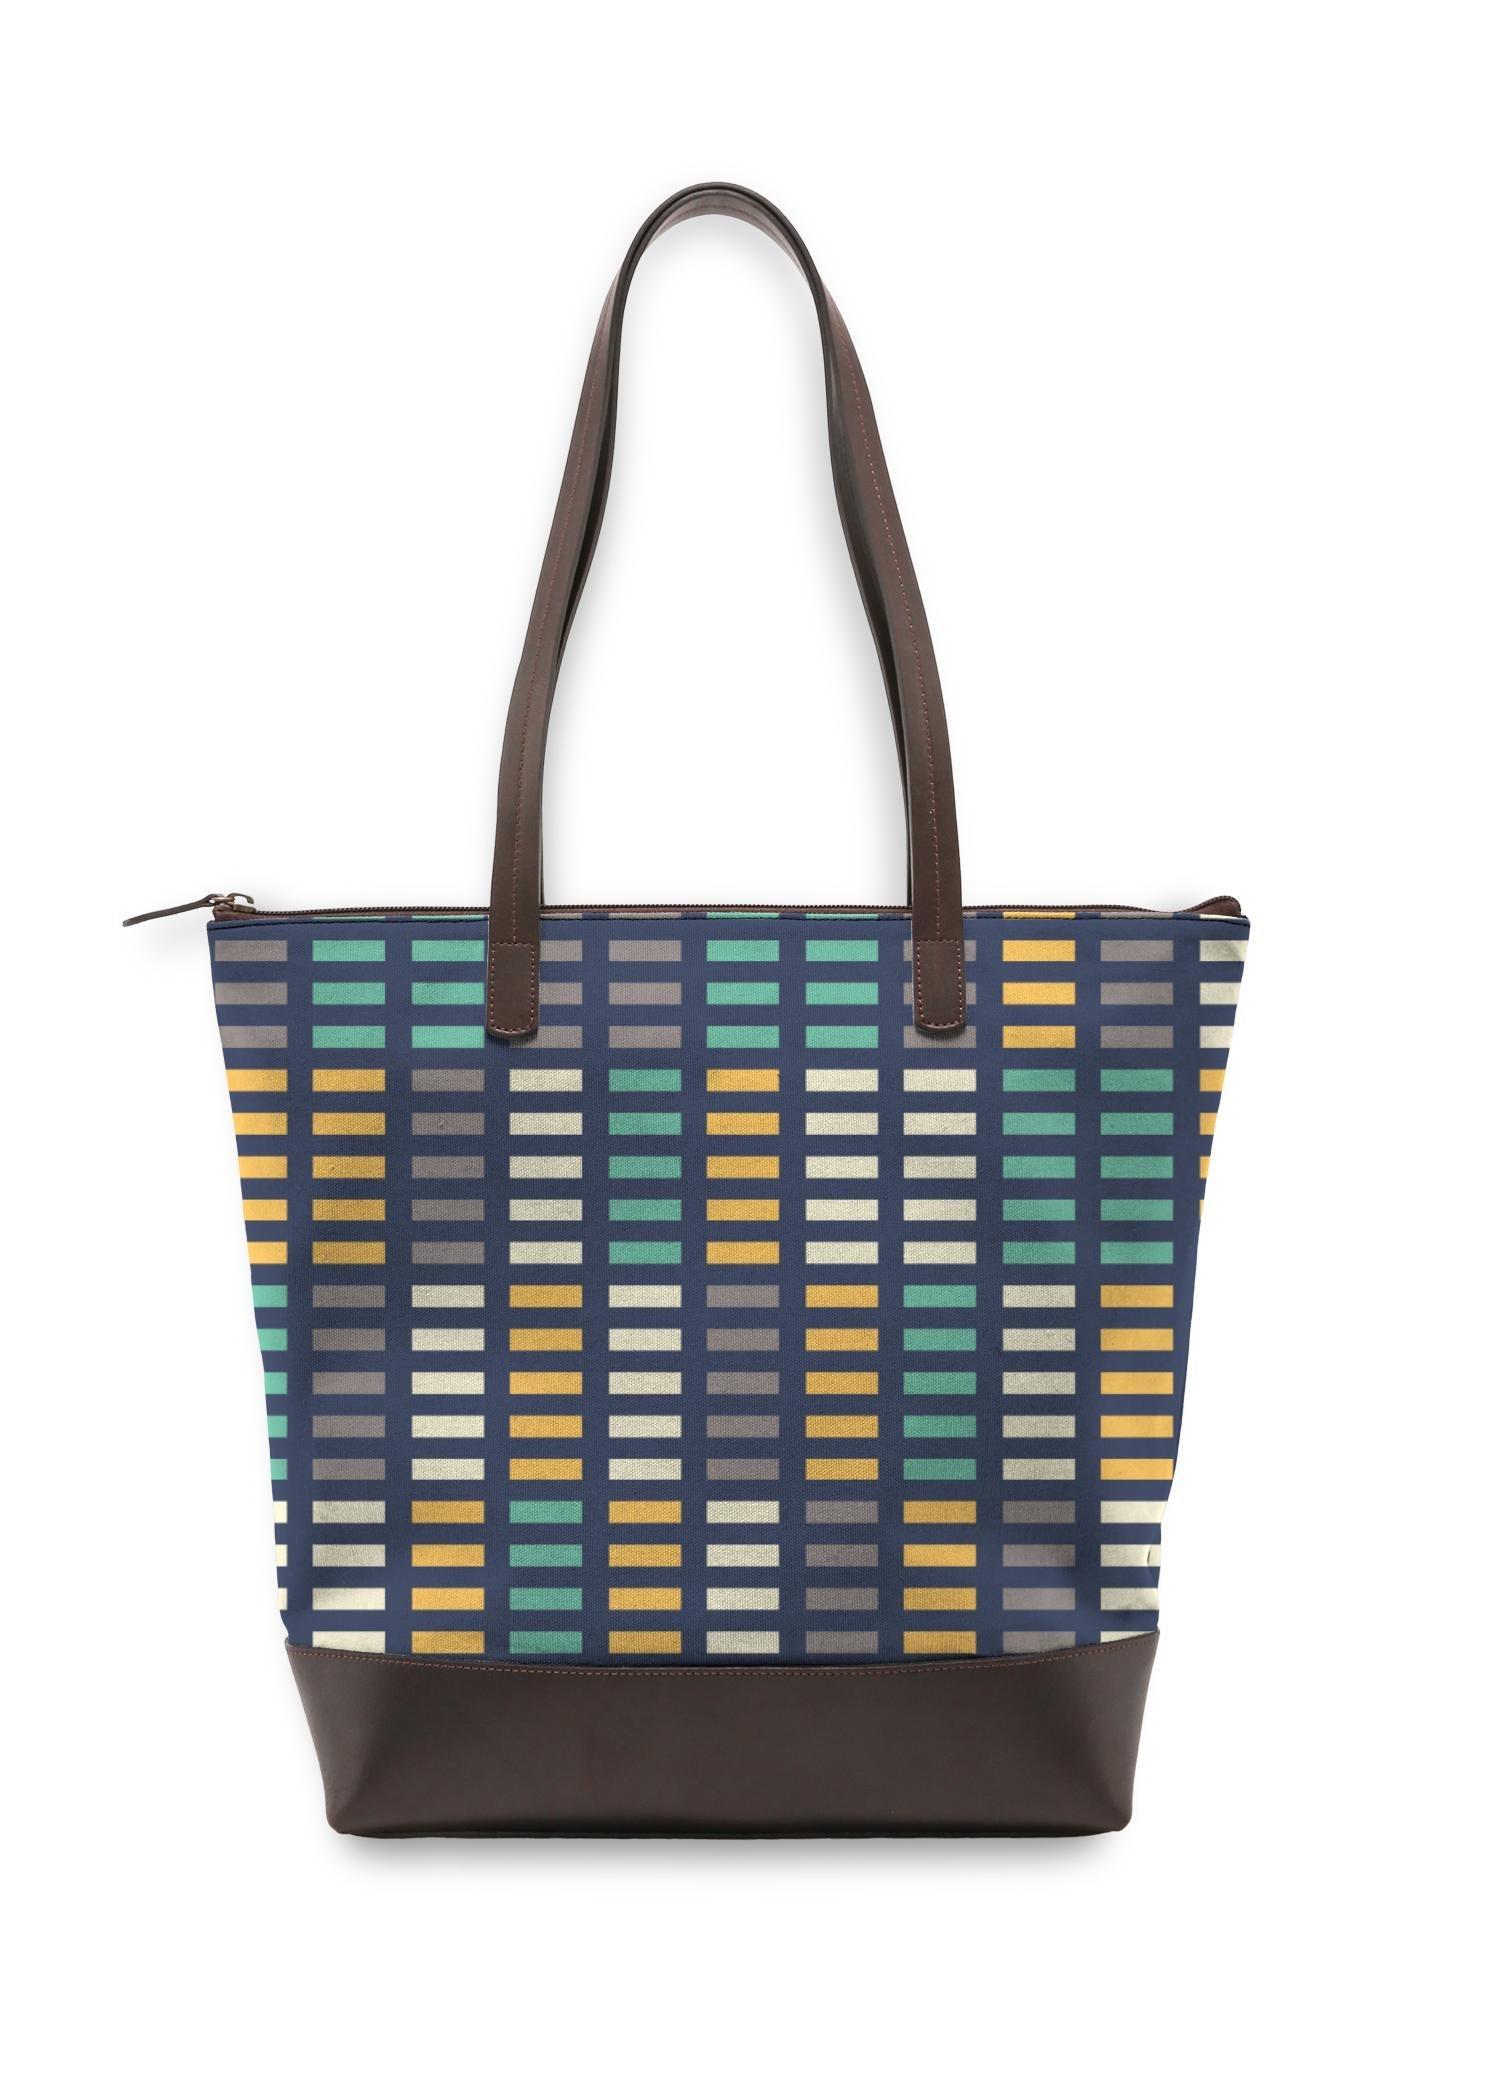 VIDA Statement Bag - Music Equalizer by VIDA Original Artist  - Size: One Size